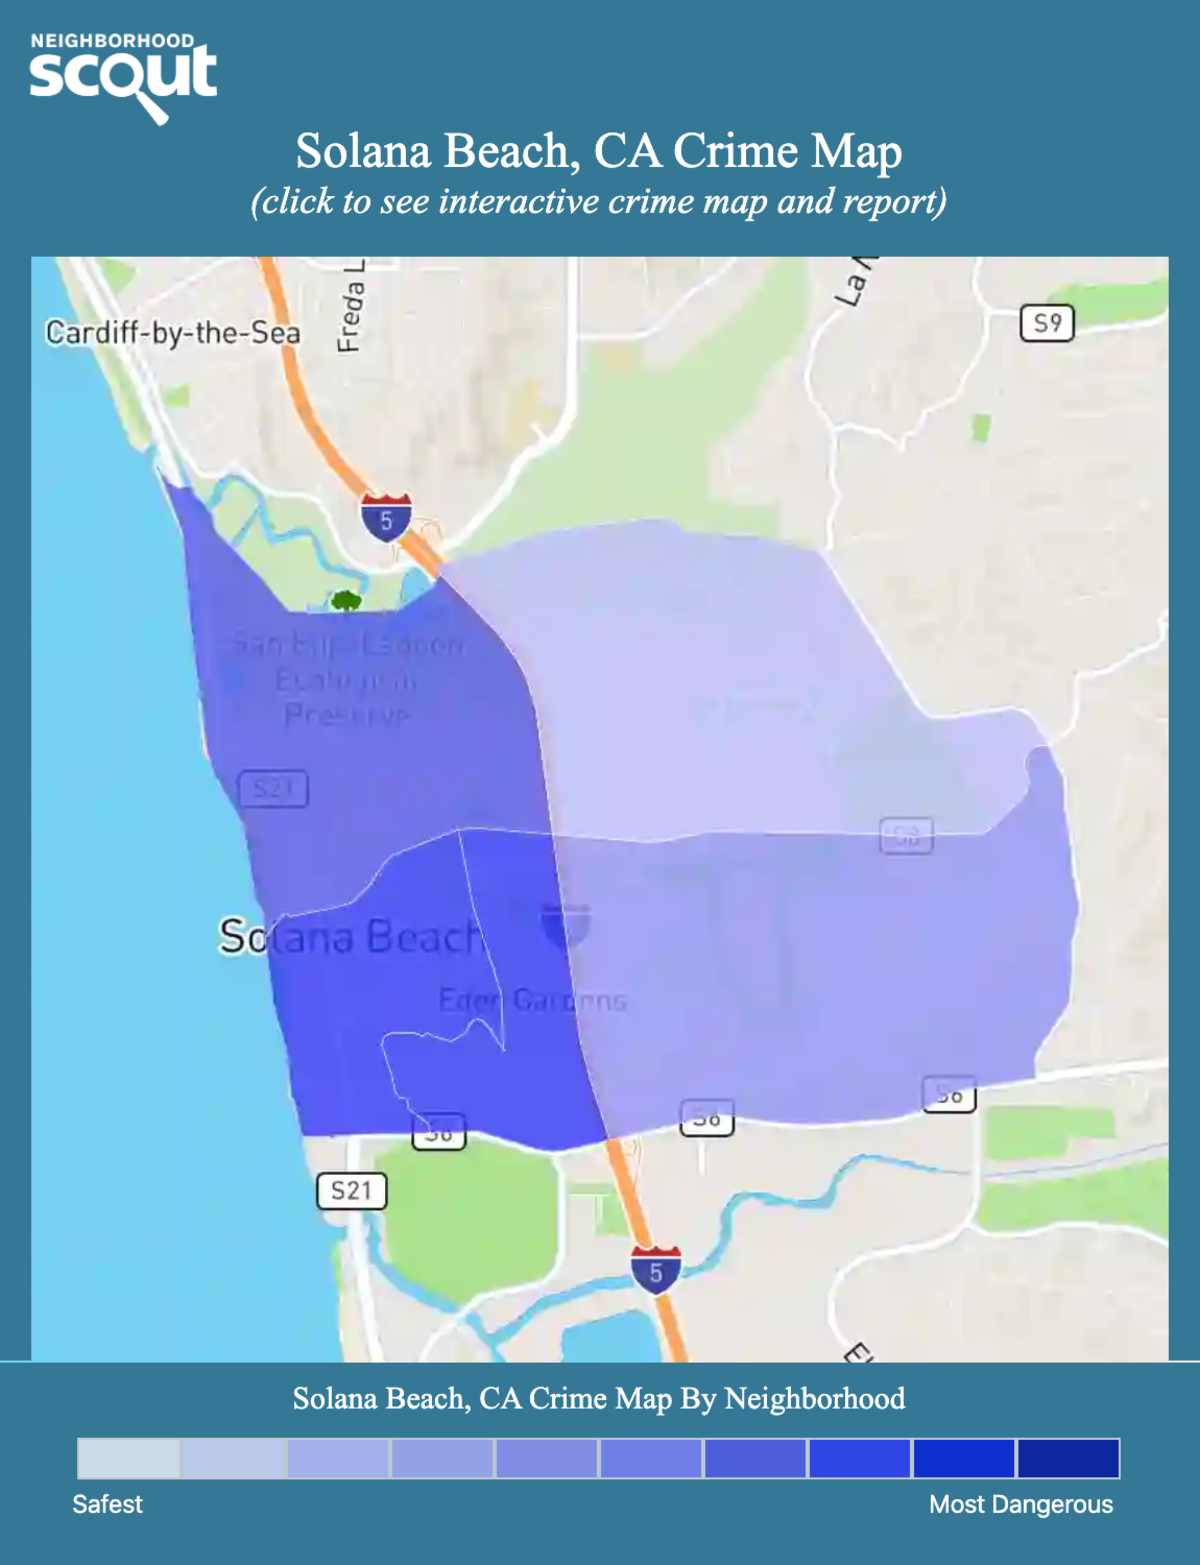 Solana Beach, California crime map